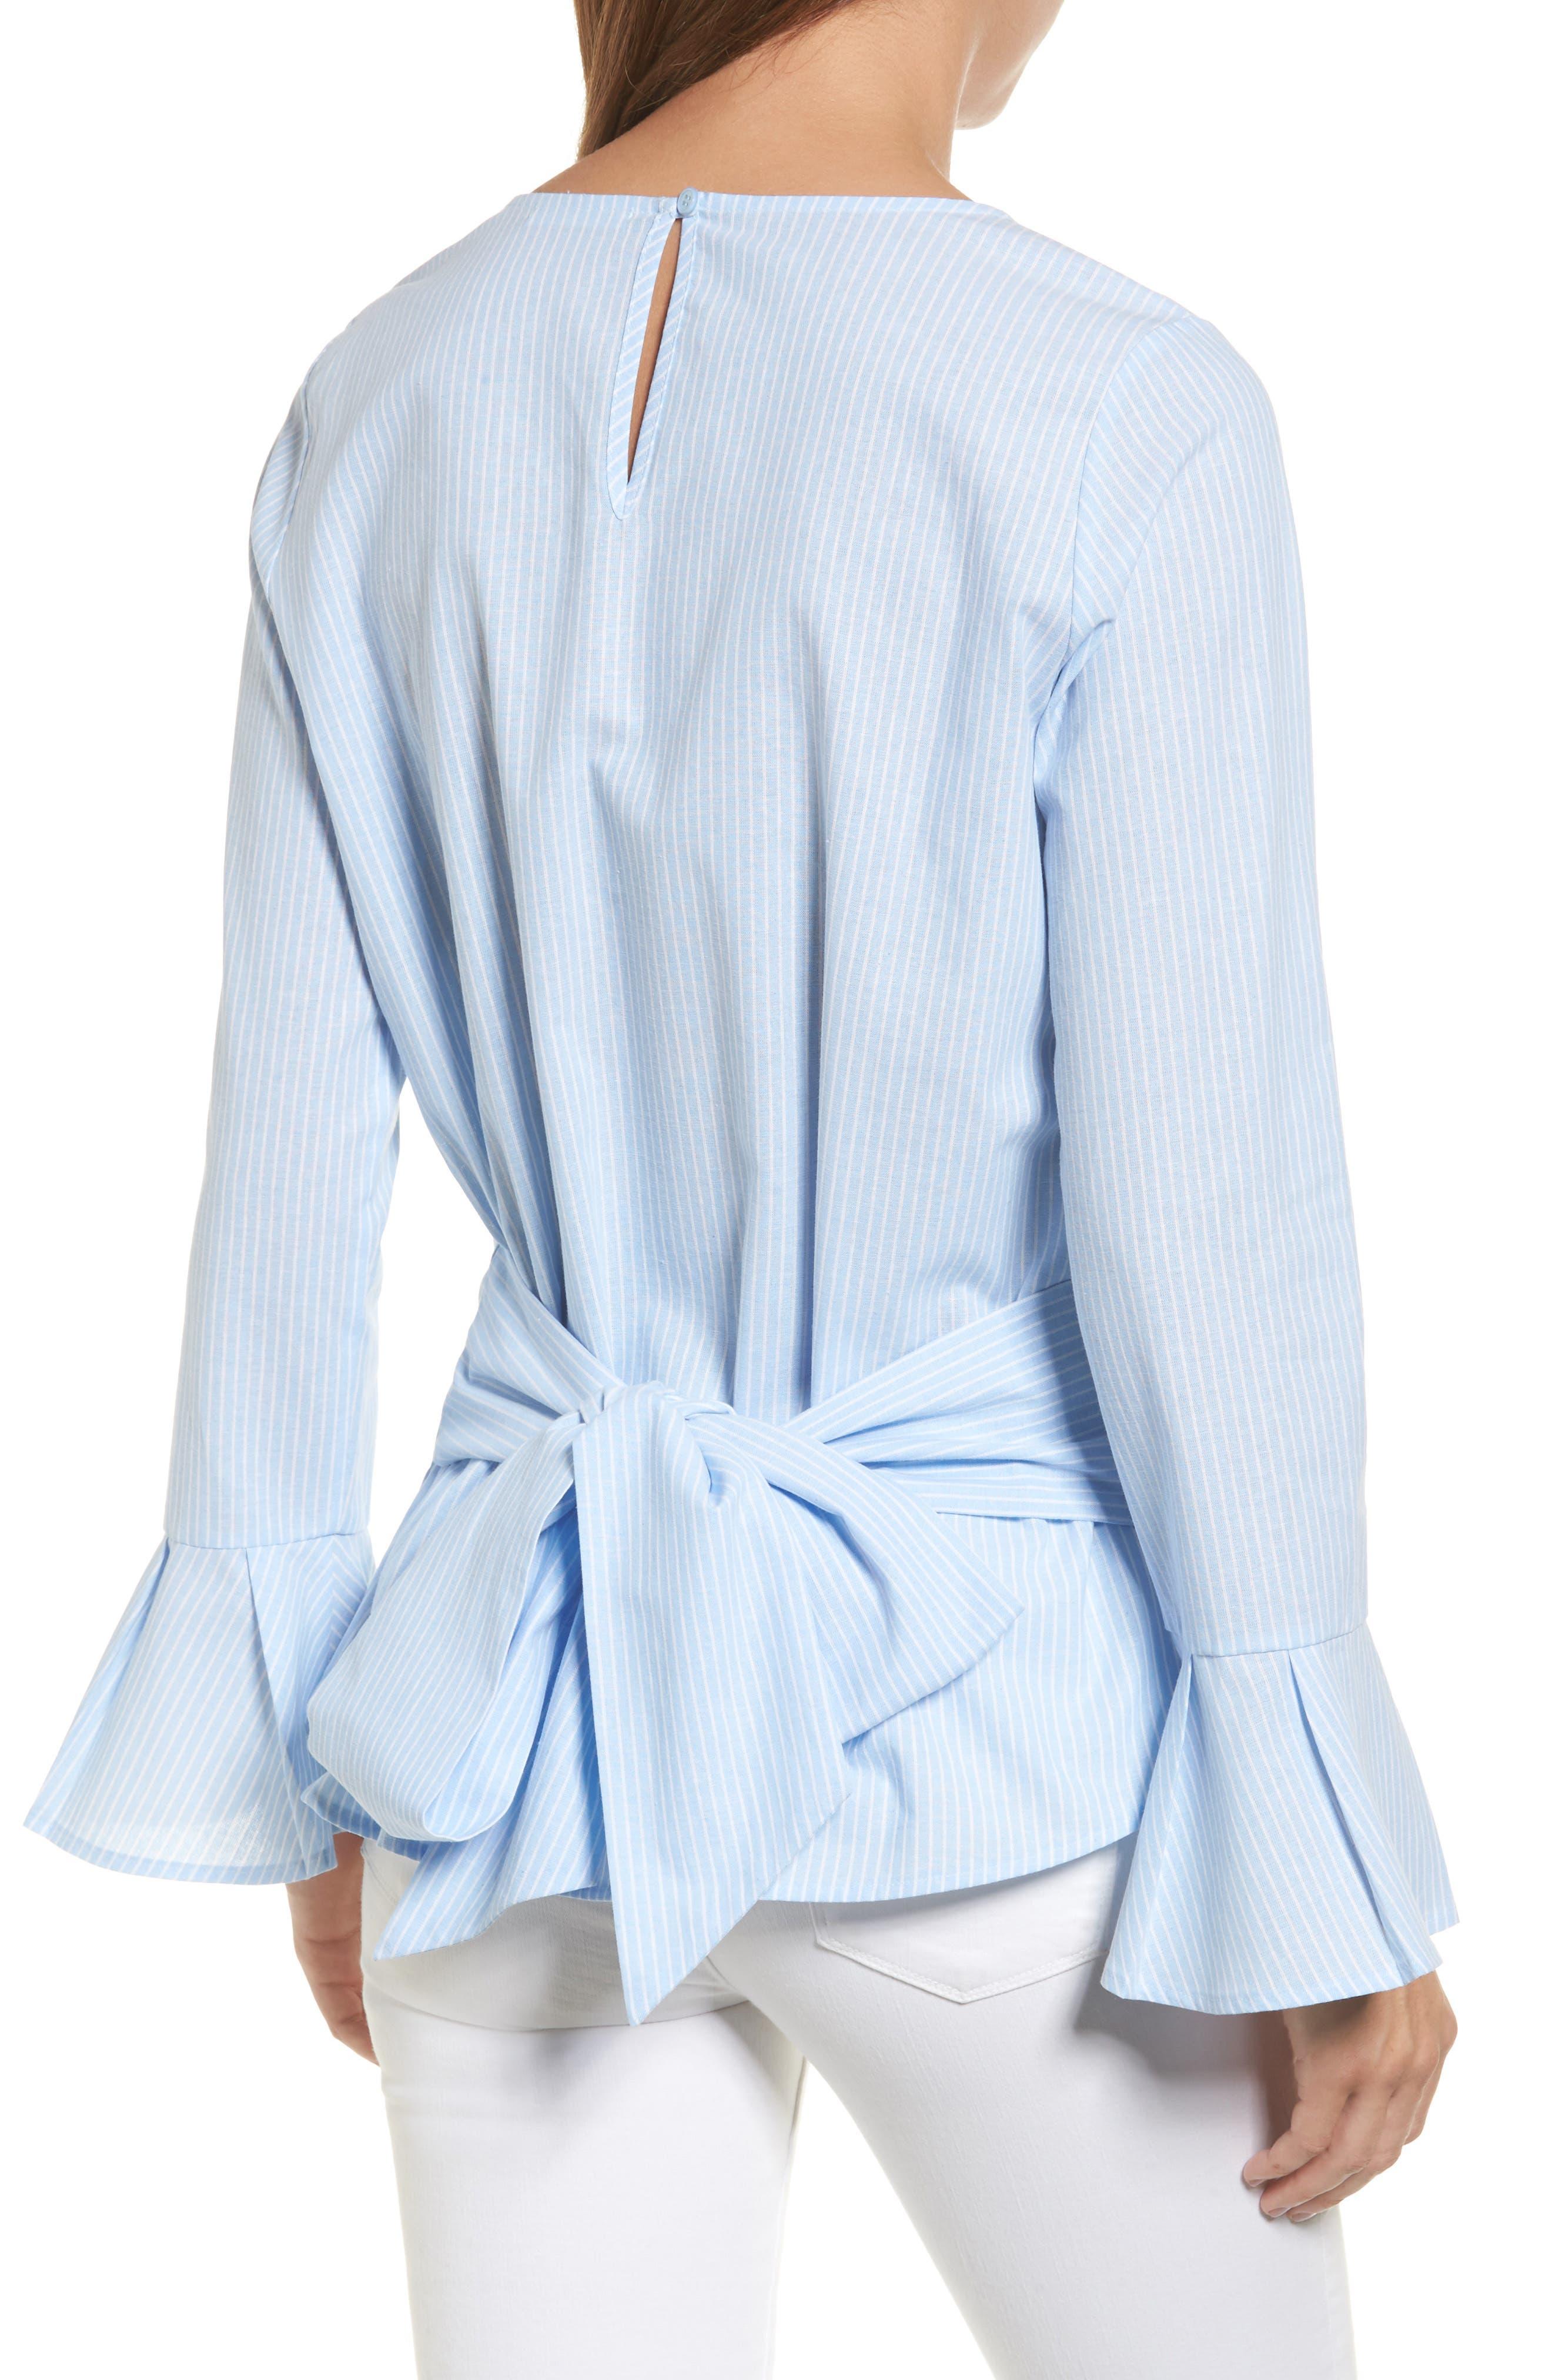 Alternate Image 1 Selected - Pleione Tie Back Wrap Blouse